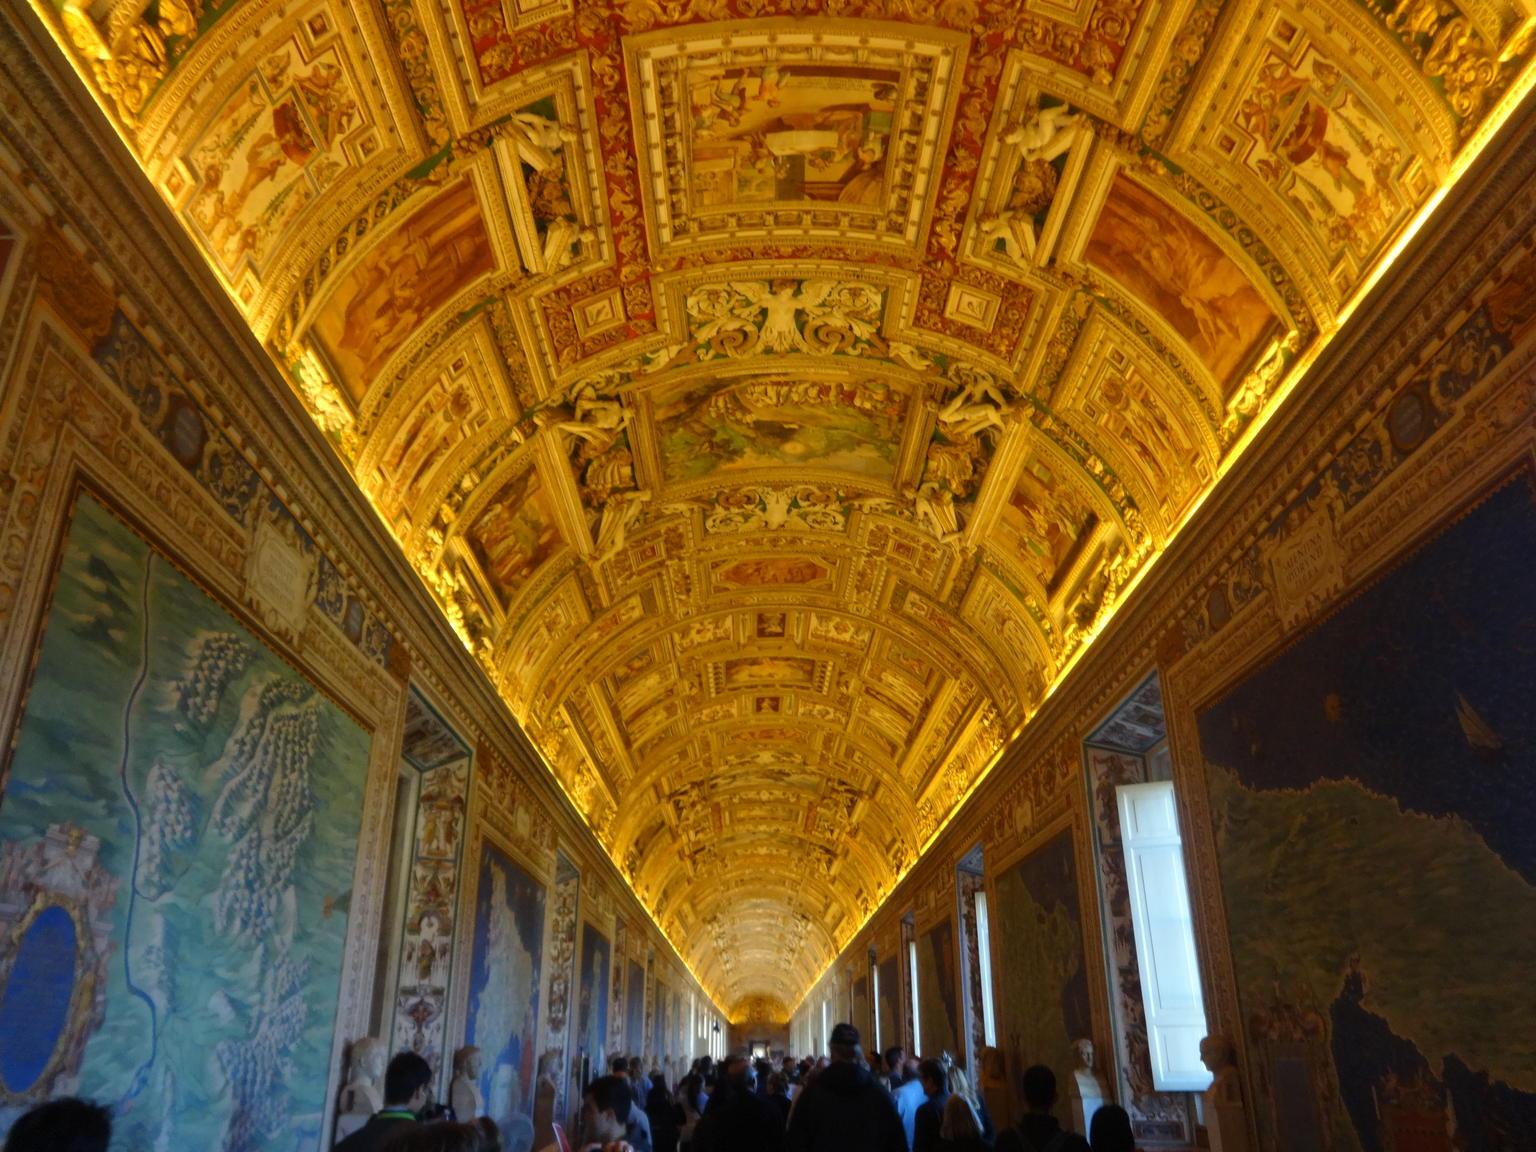 MORE PHOTOS, Skip the Line Private Tour: Vatican Museums Sistine Chapel St Peter Basilica